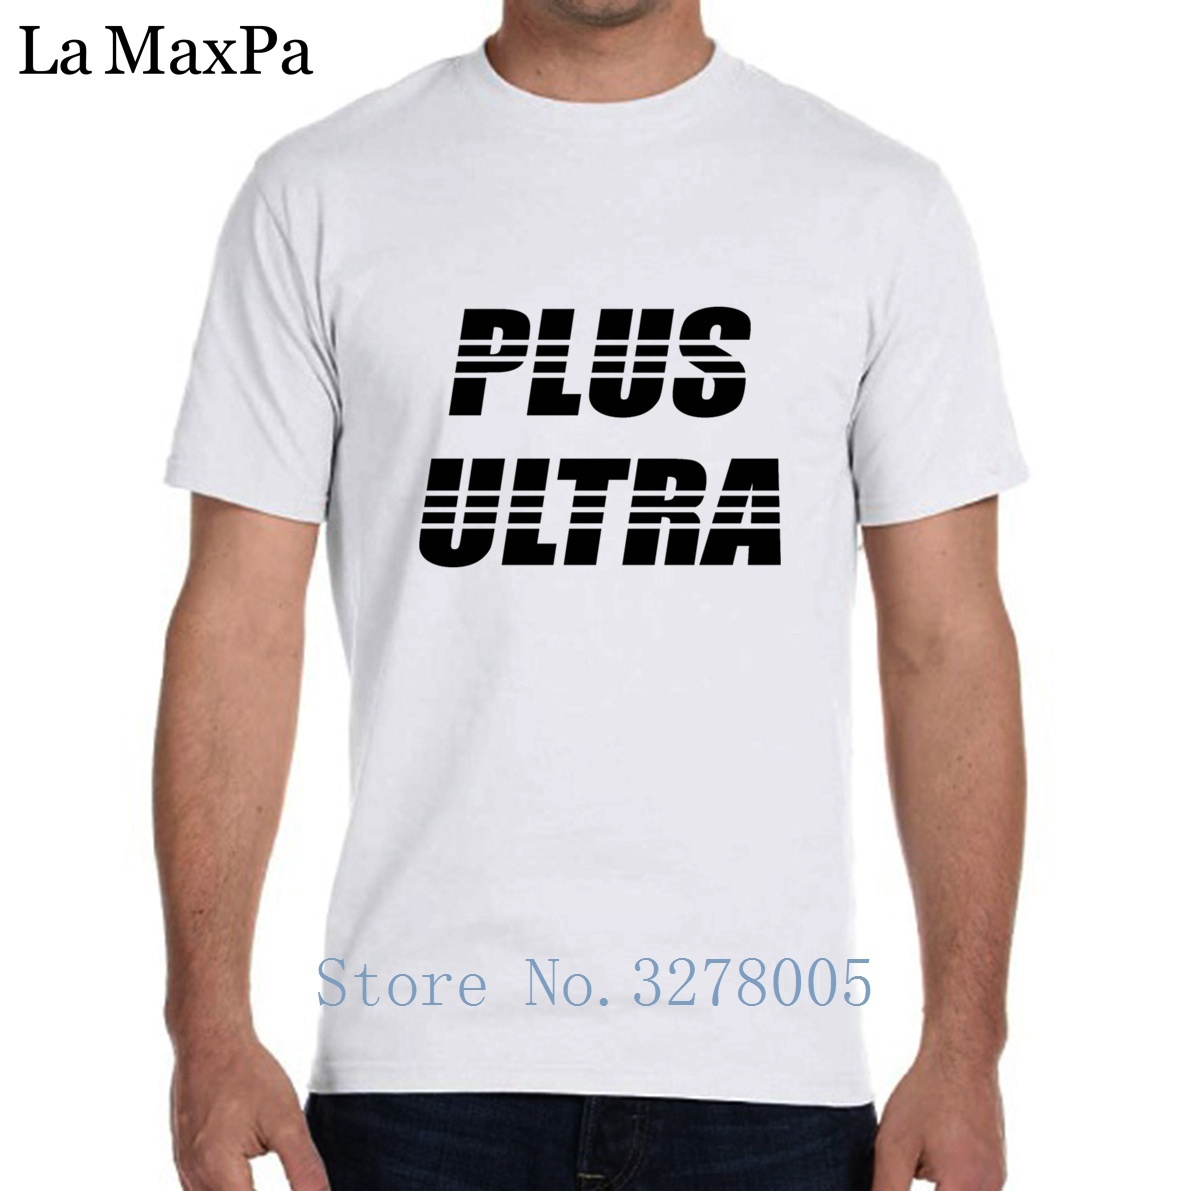 La Maxza Custom Men's T-Shirt Super Plus Ultra Black Tshirt For Men Outfit Camiseta Personalizada 2018 Round Neck Famous